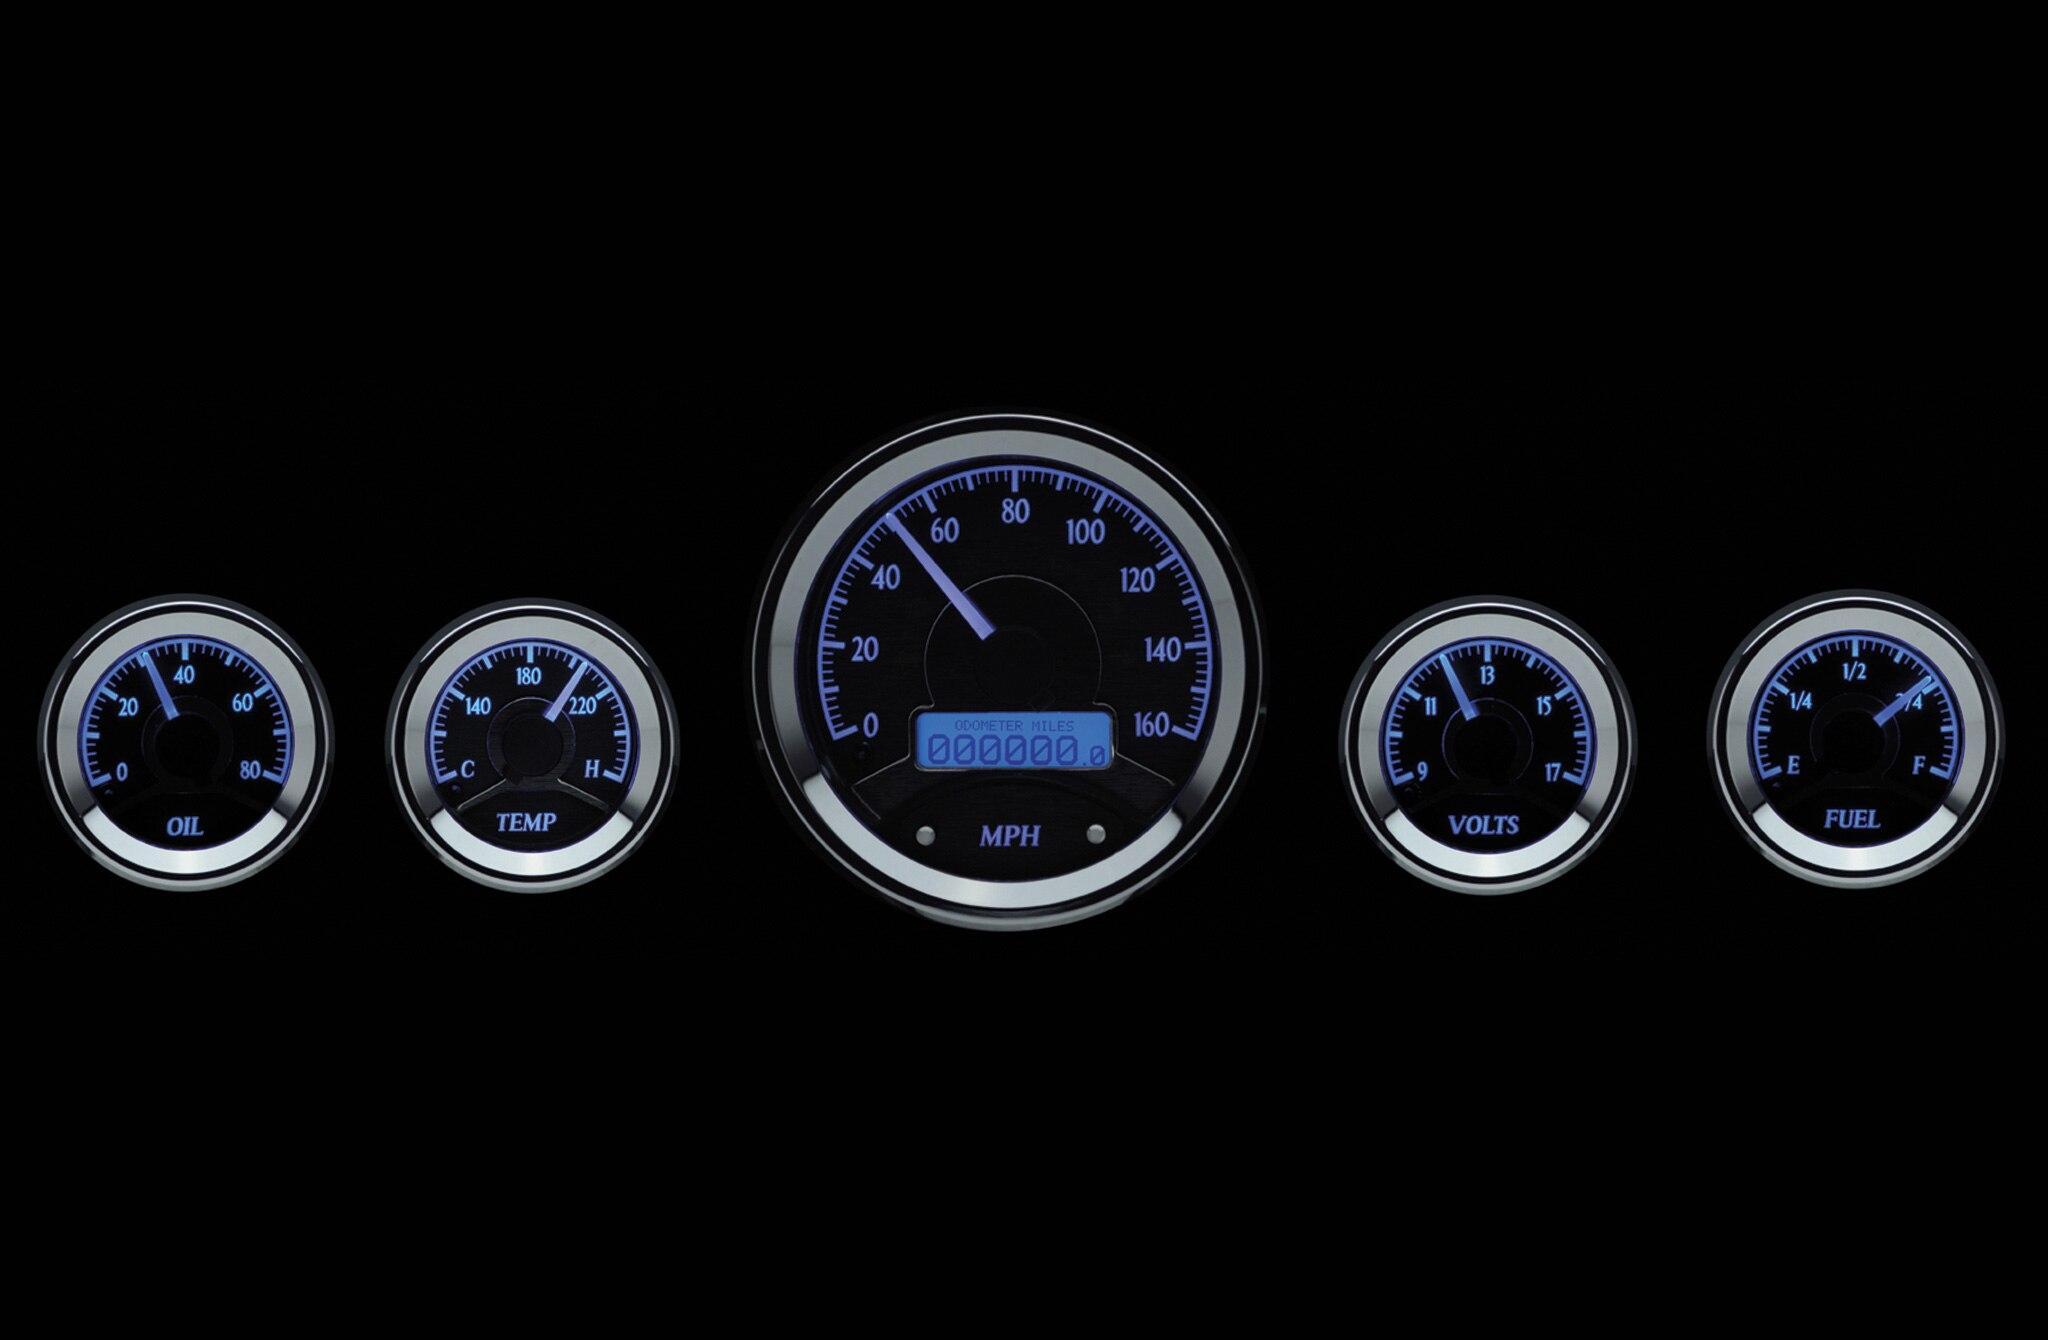 lowrider-new-products-july-2014-dakota-digital-VHX-1050-gauges2